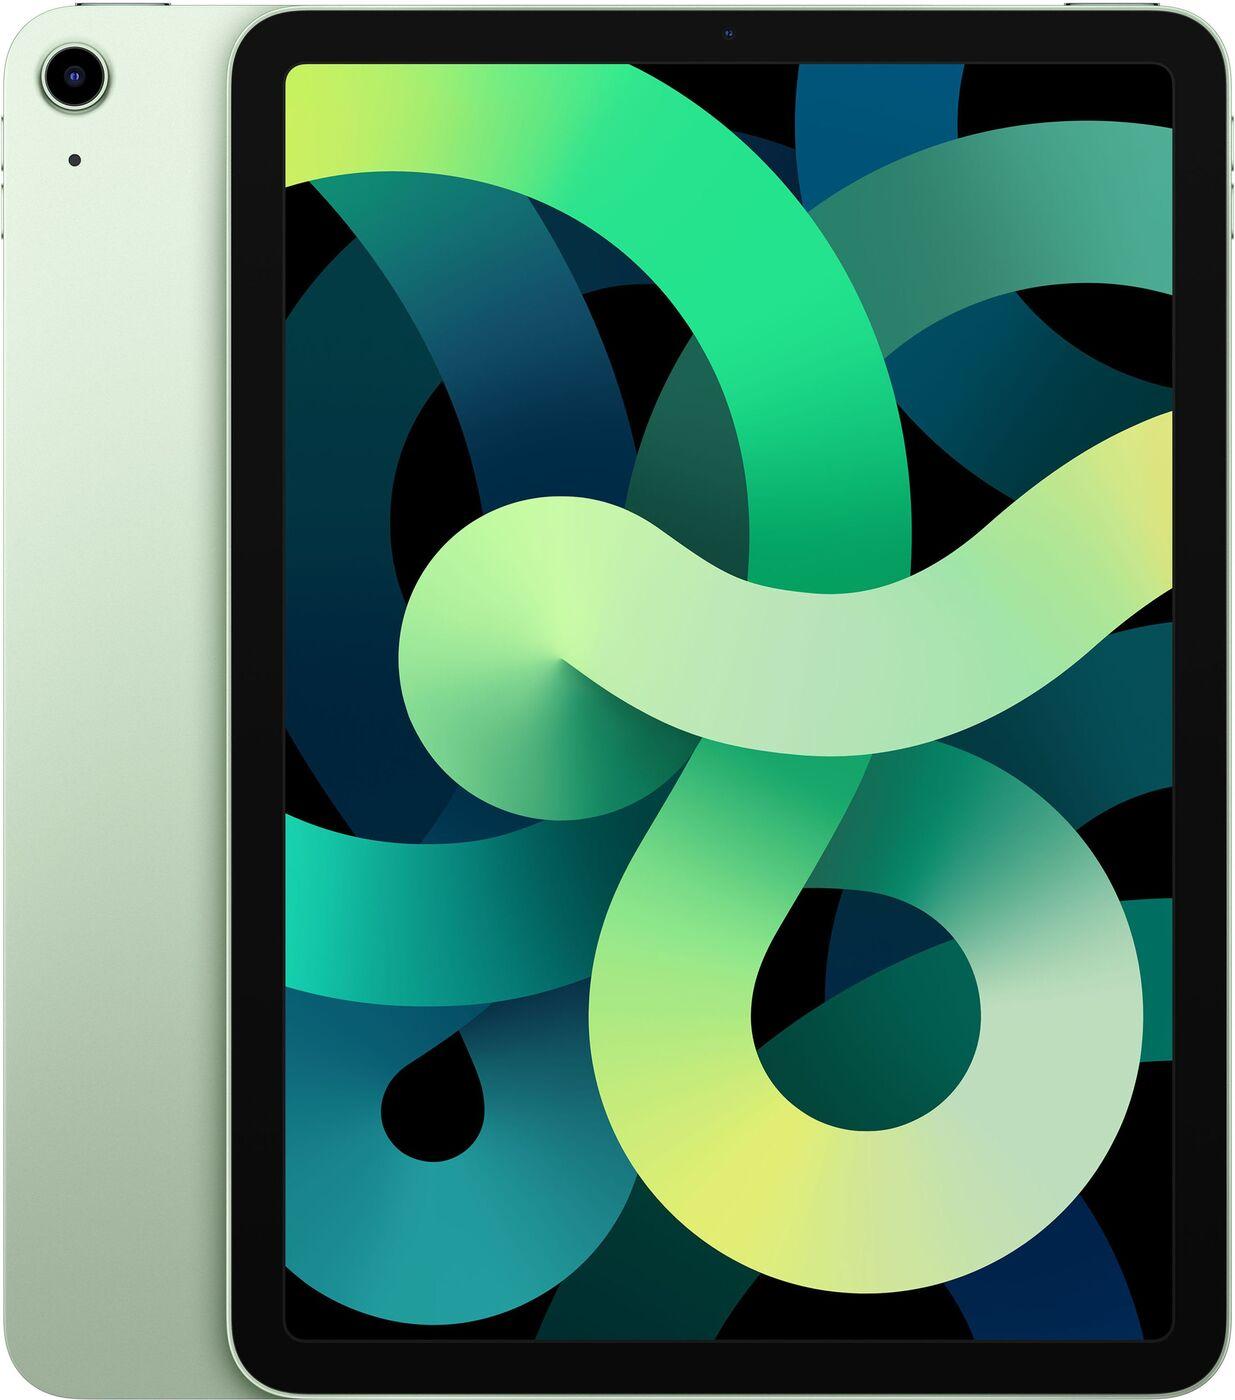 "планшет apple ipad air 4th gen wi-fi 10.9"", 64 gb, серый. уцененный товар"